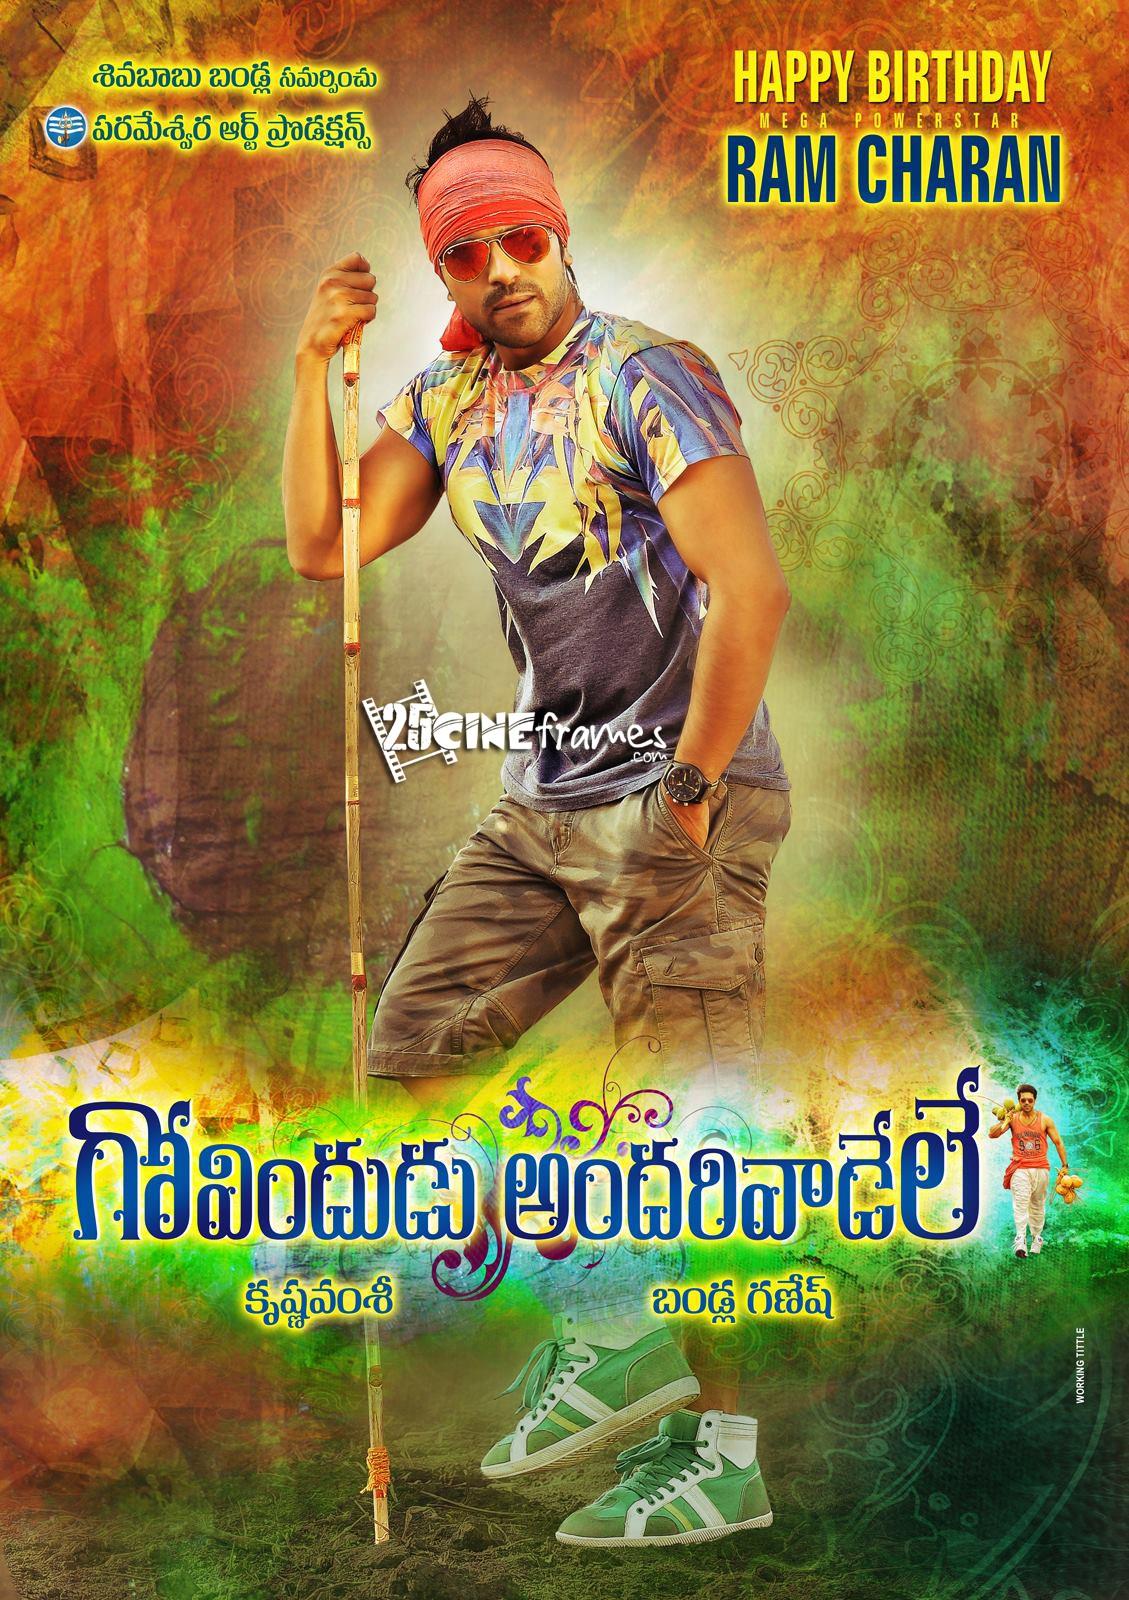 Ram Charan Govindudu Andharivadele First Look Hd Posters 25cineframes